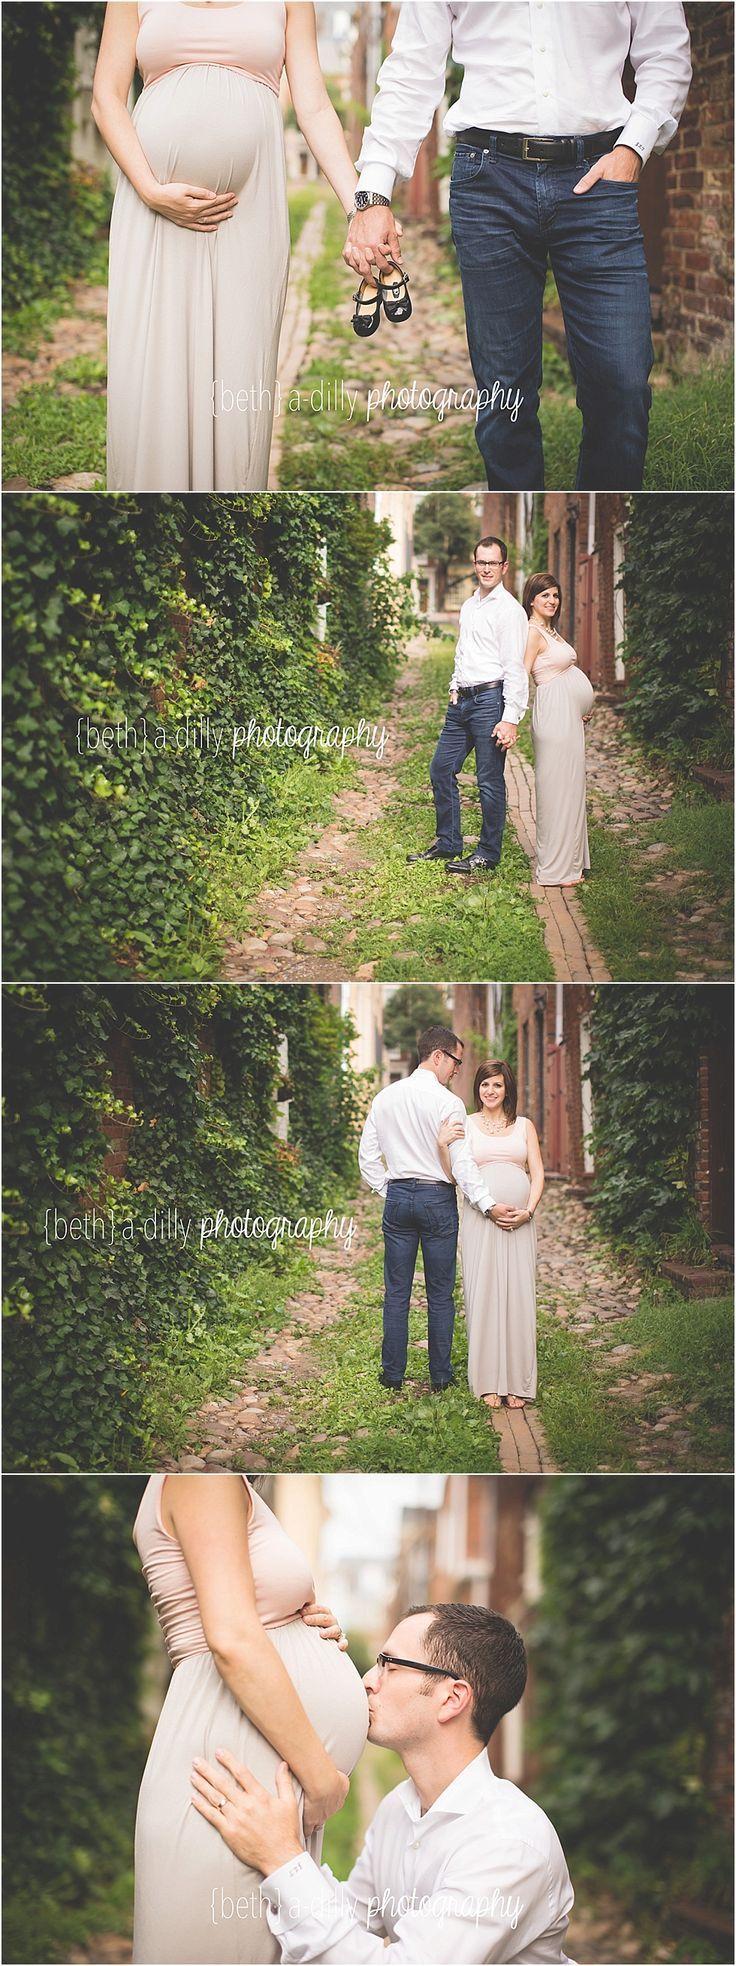 a baby girl bump + charming puppy paws | northern virginia maternity photographer » beth a-dilly photography | Alexandria VA, Fairfax VA, DC | Family, Children, Maternity, Engagement Photographer